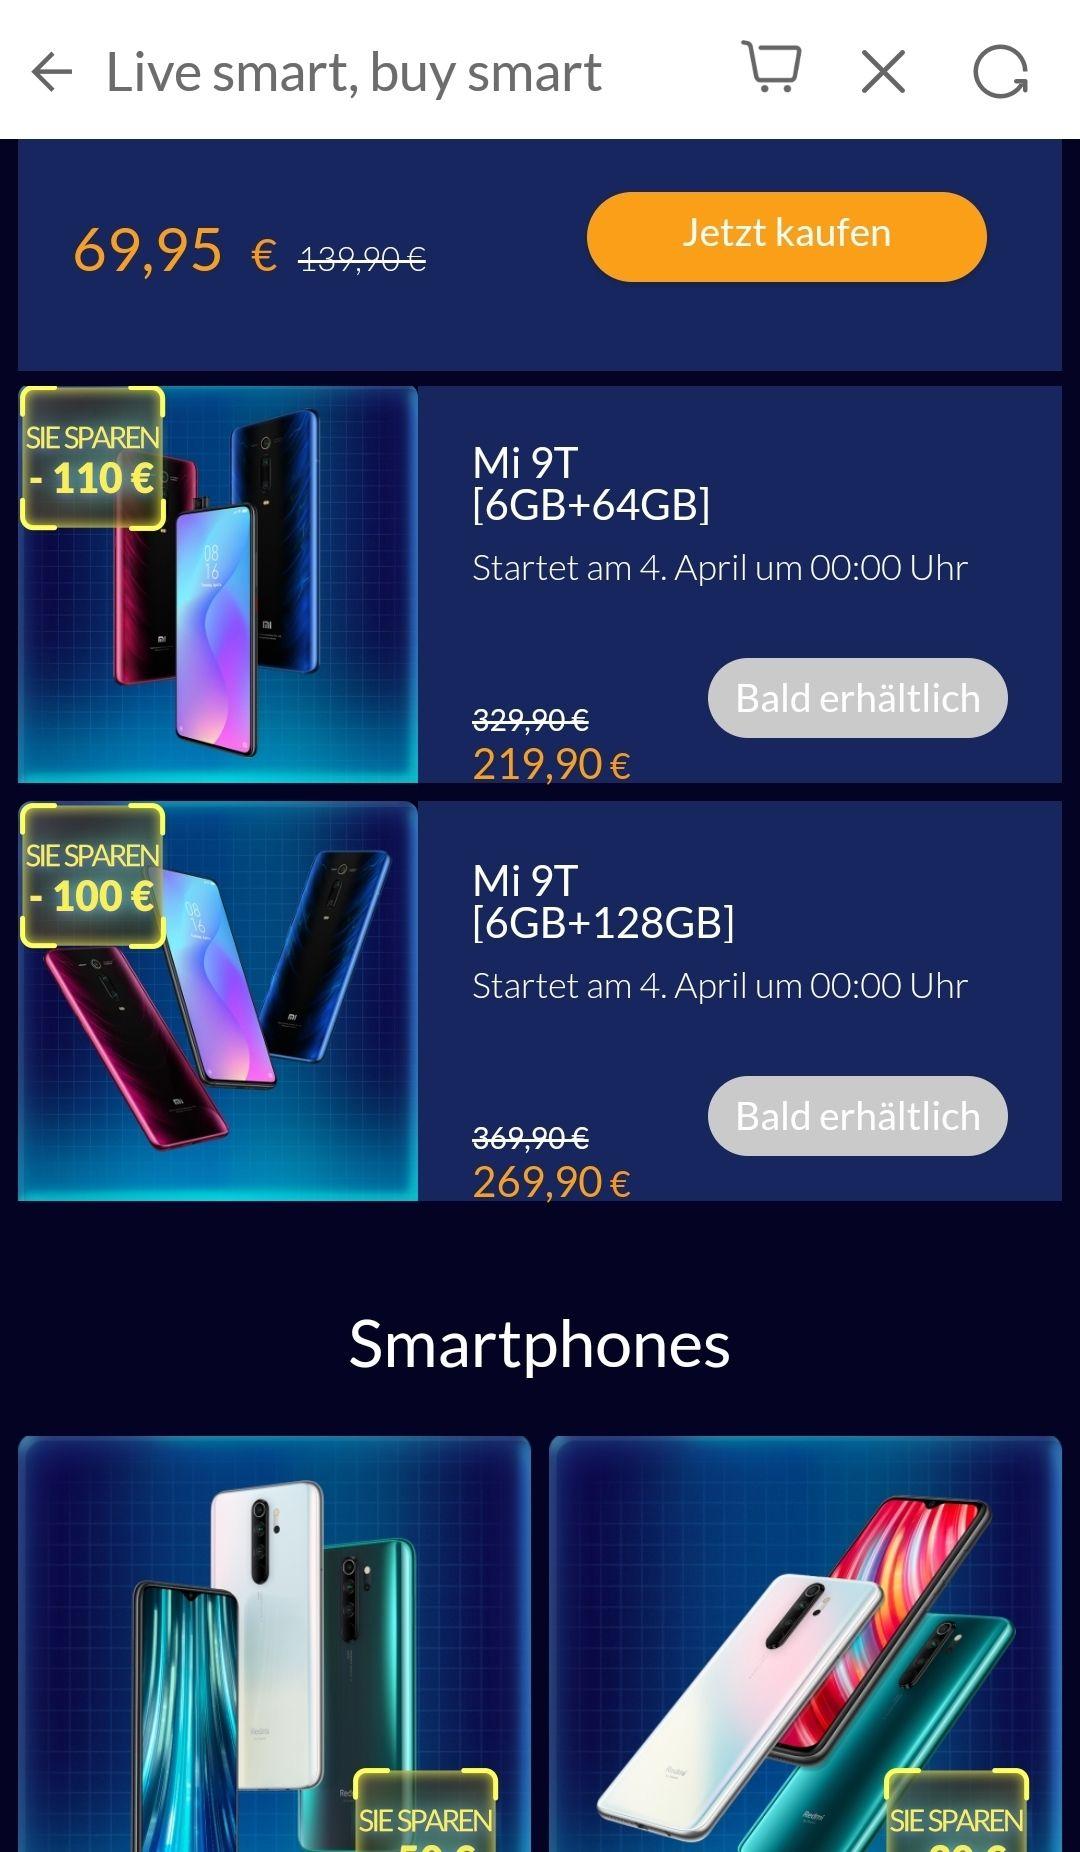 Mi fan Festival 2020 u.a. Xiaomi Mi 9T 6/64 für 198.91€ zweit Bestpreis